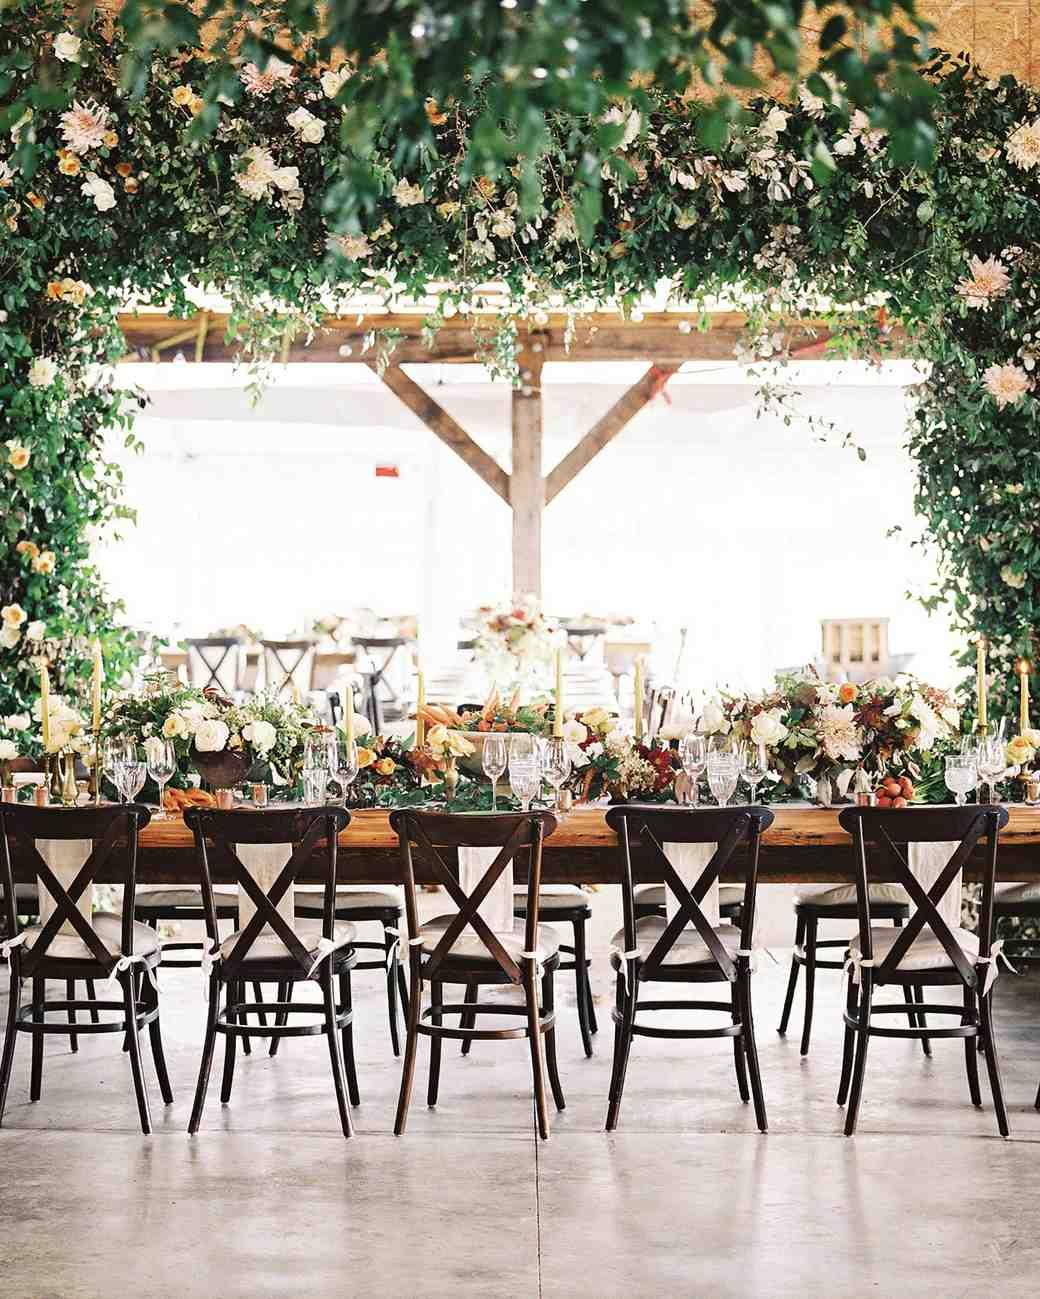 Top 25 Best Wedding Head Tables Ideas On Pinterest: An Elegant-Meets-Rustic Farm Wedding In North Carolina